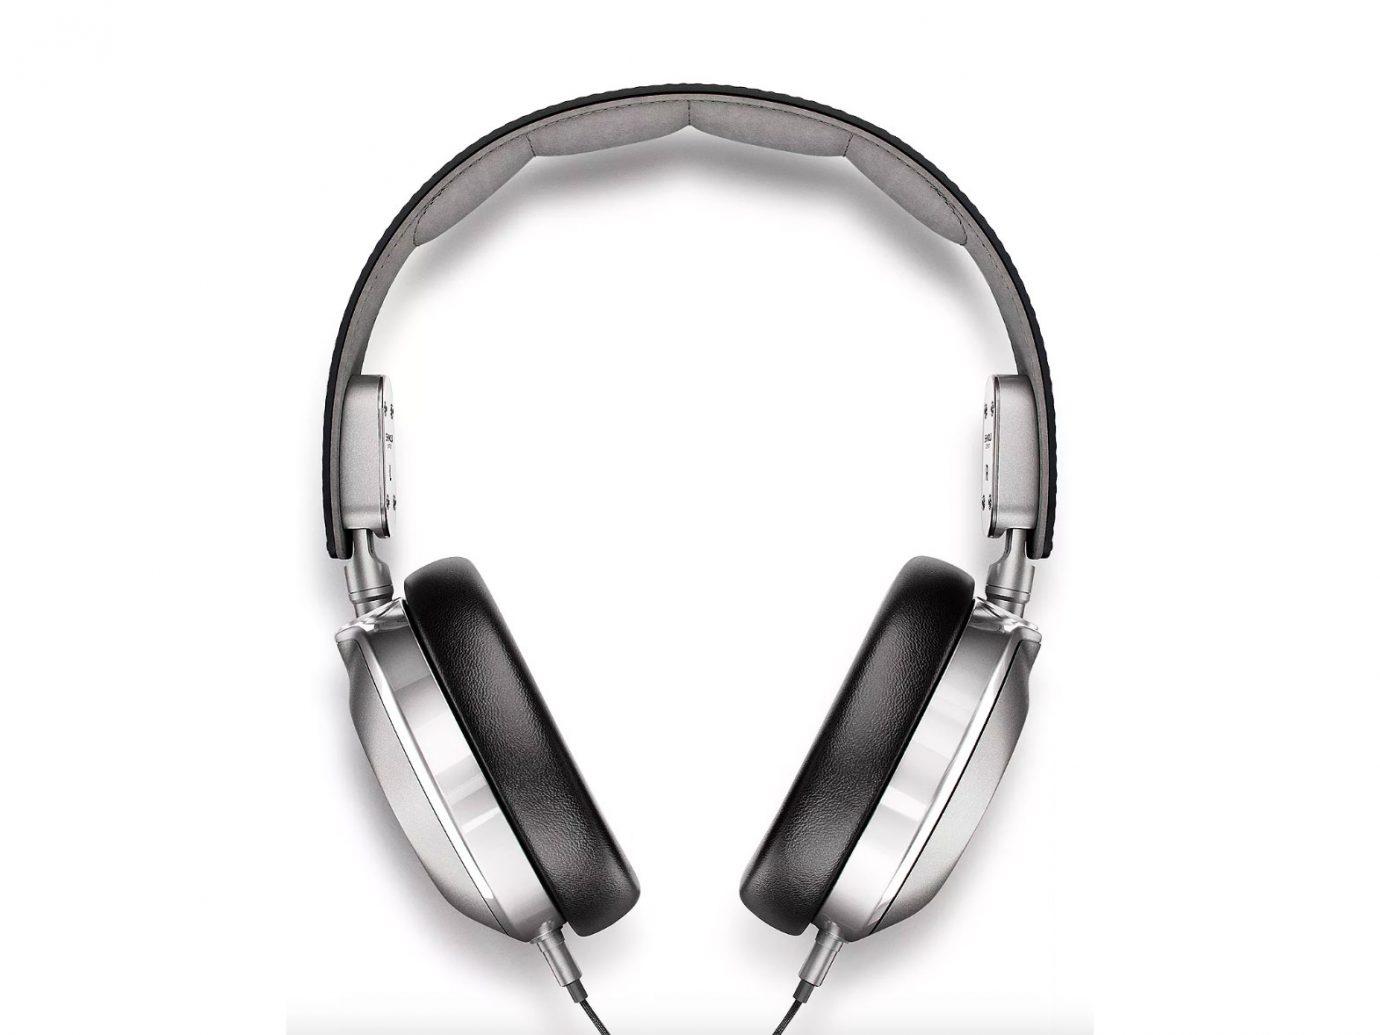 Shinola Canfield Over-Ear Headphones